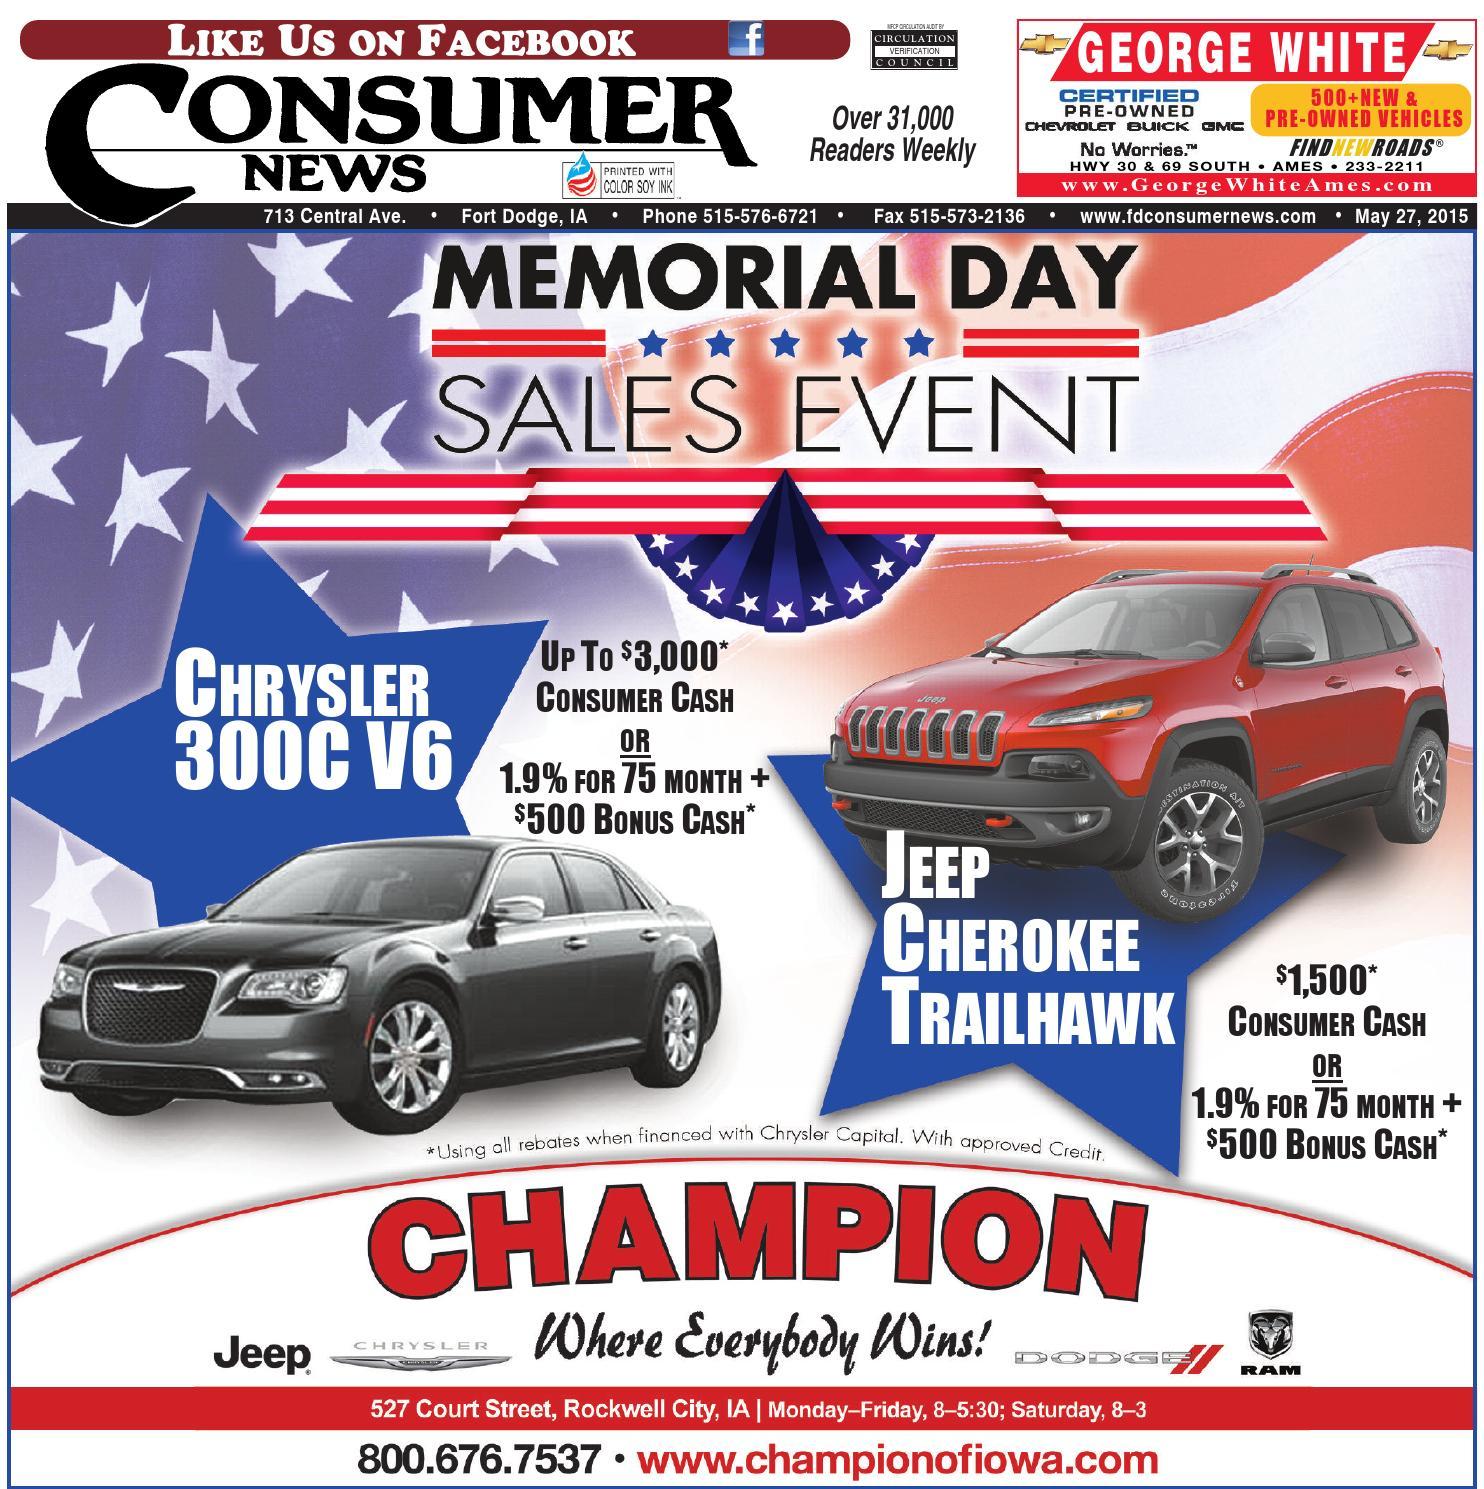 05 27 15 consumer news by consumer news issuu rh issuu com